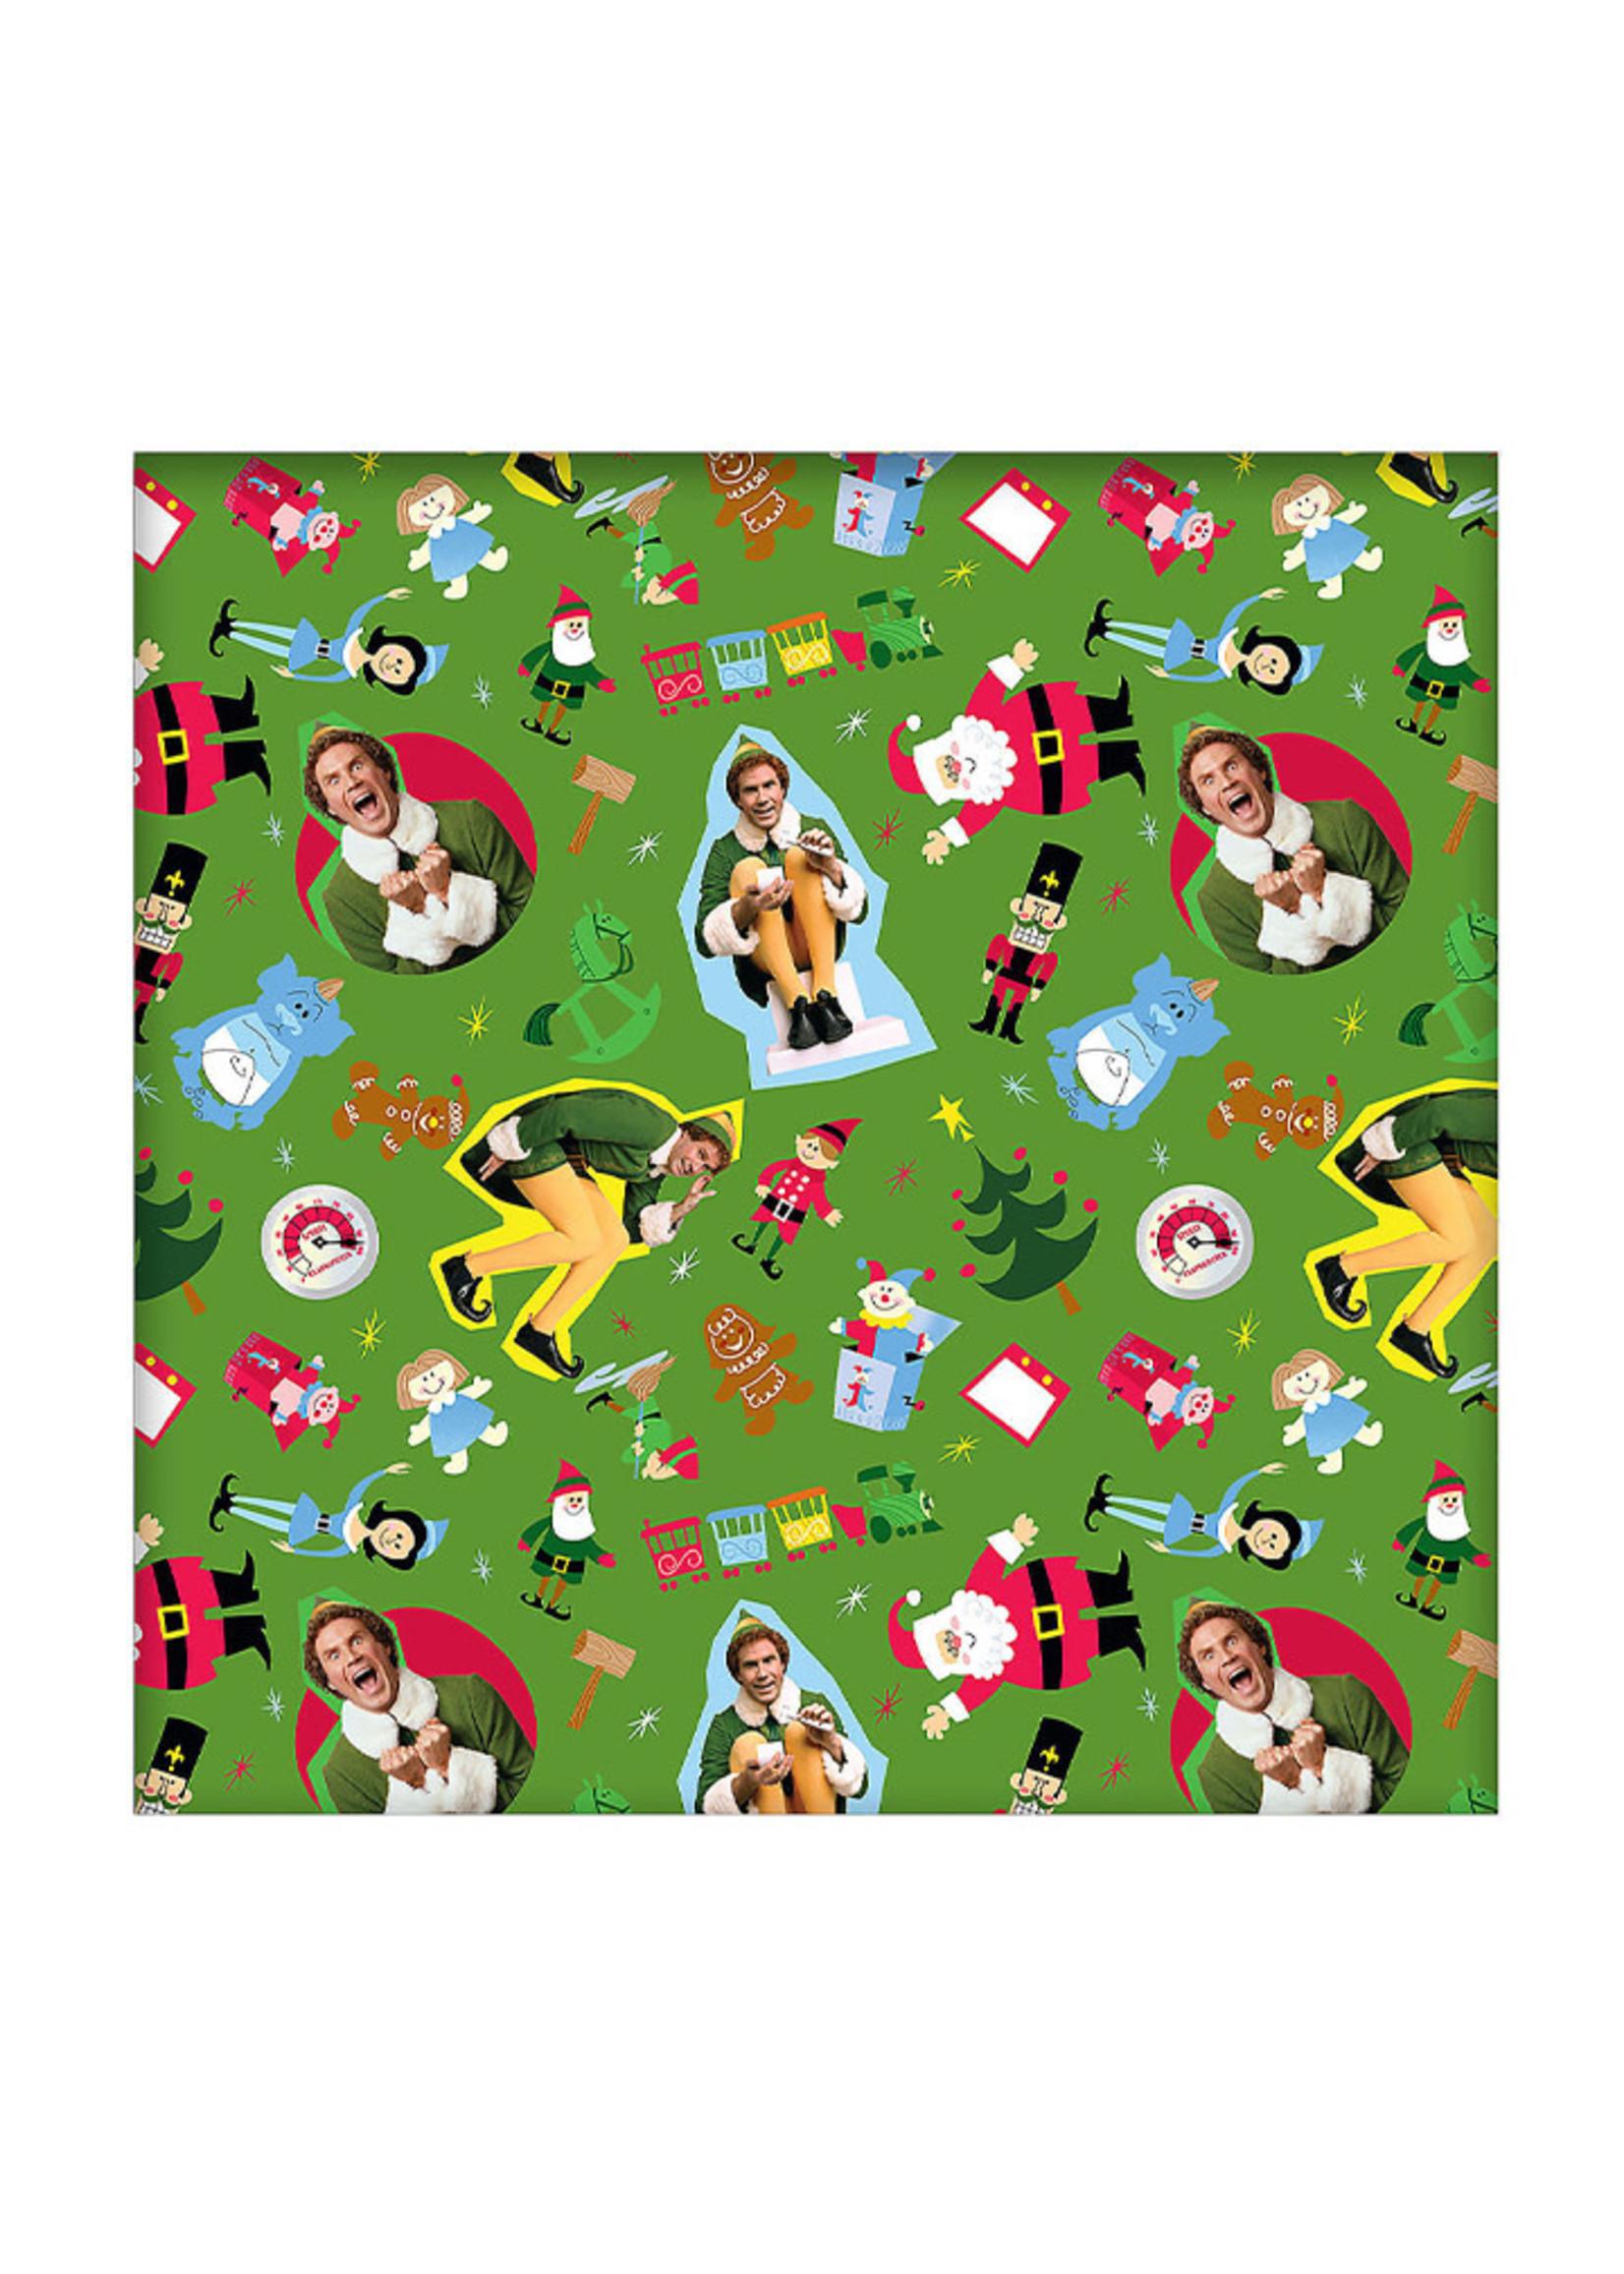 FORUM NOVELTIES Buddy the Elf Icons Luncheon Napkins - 16ct